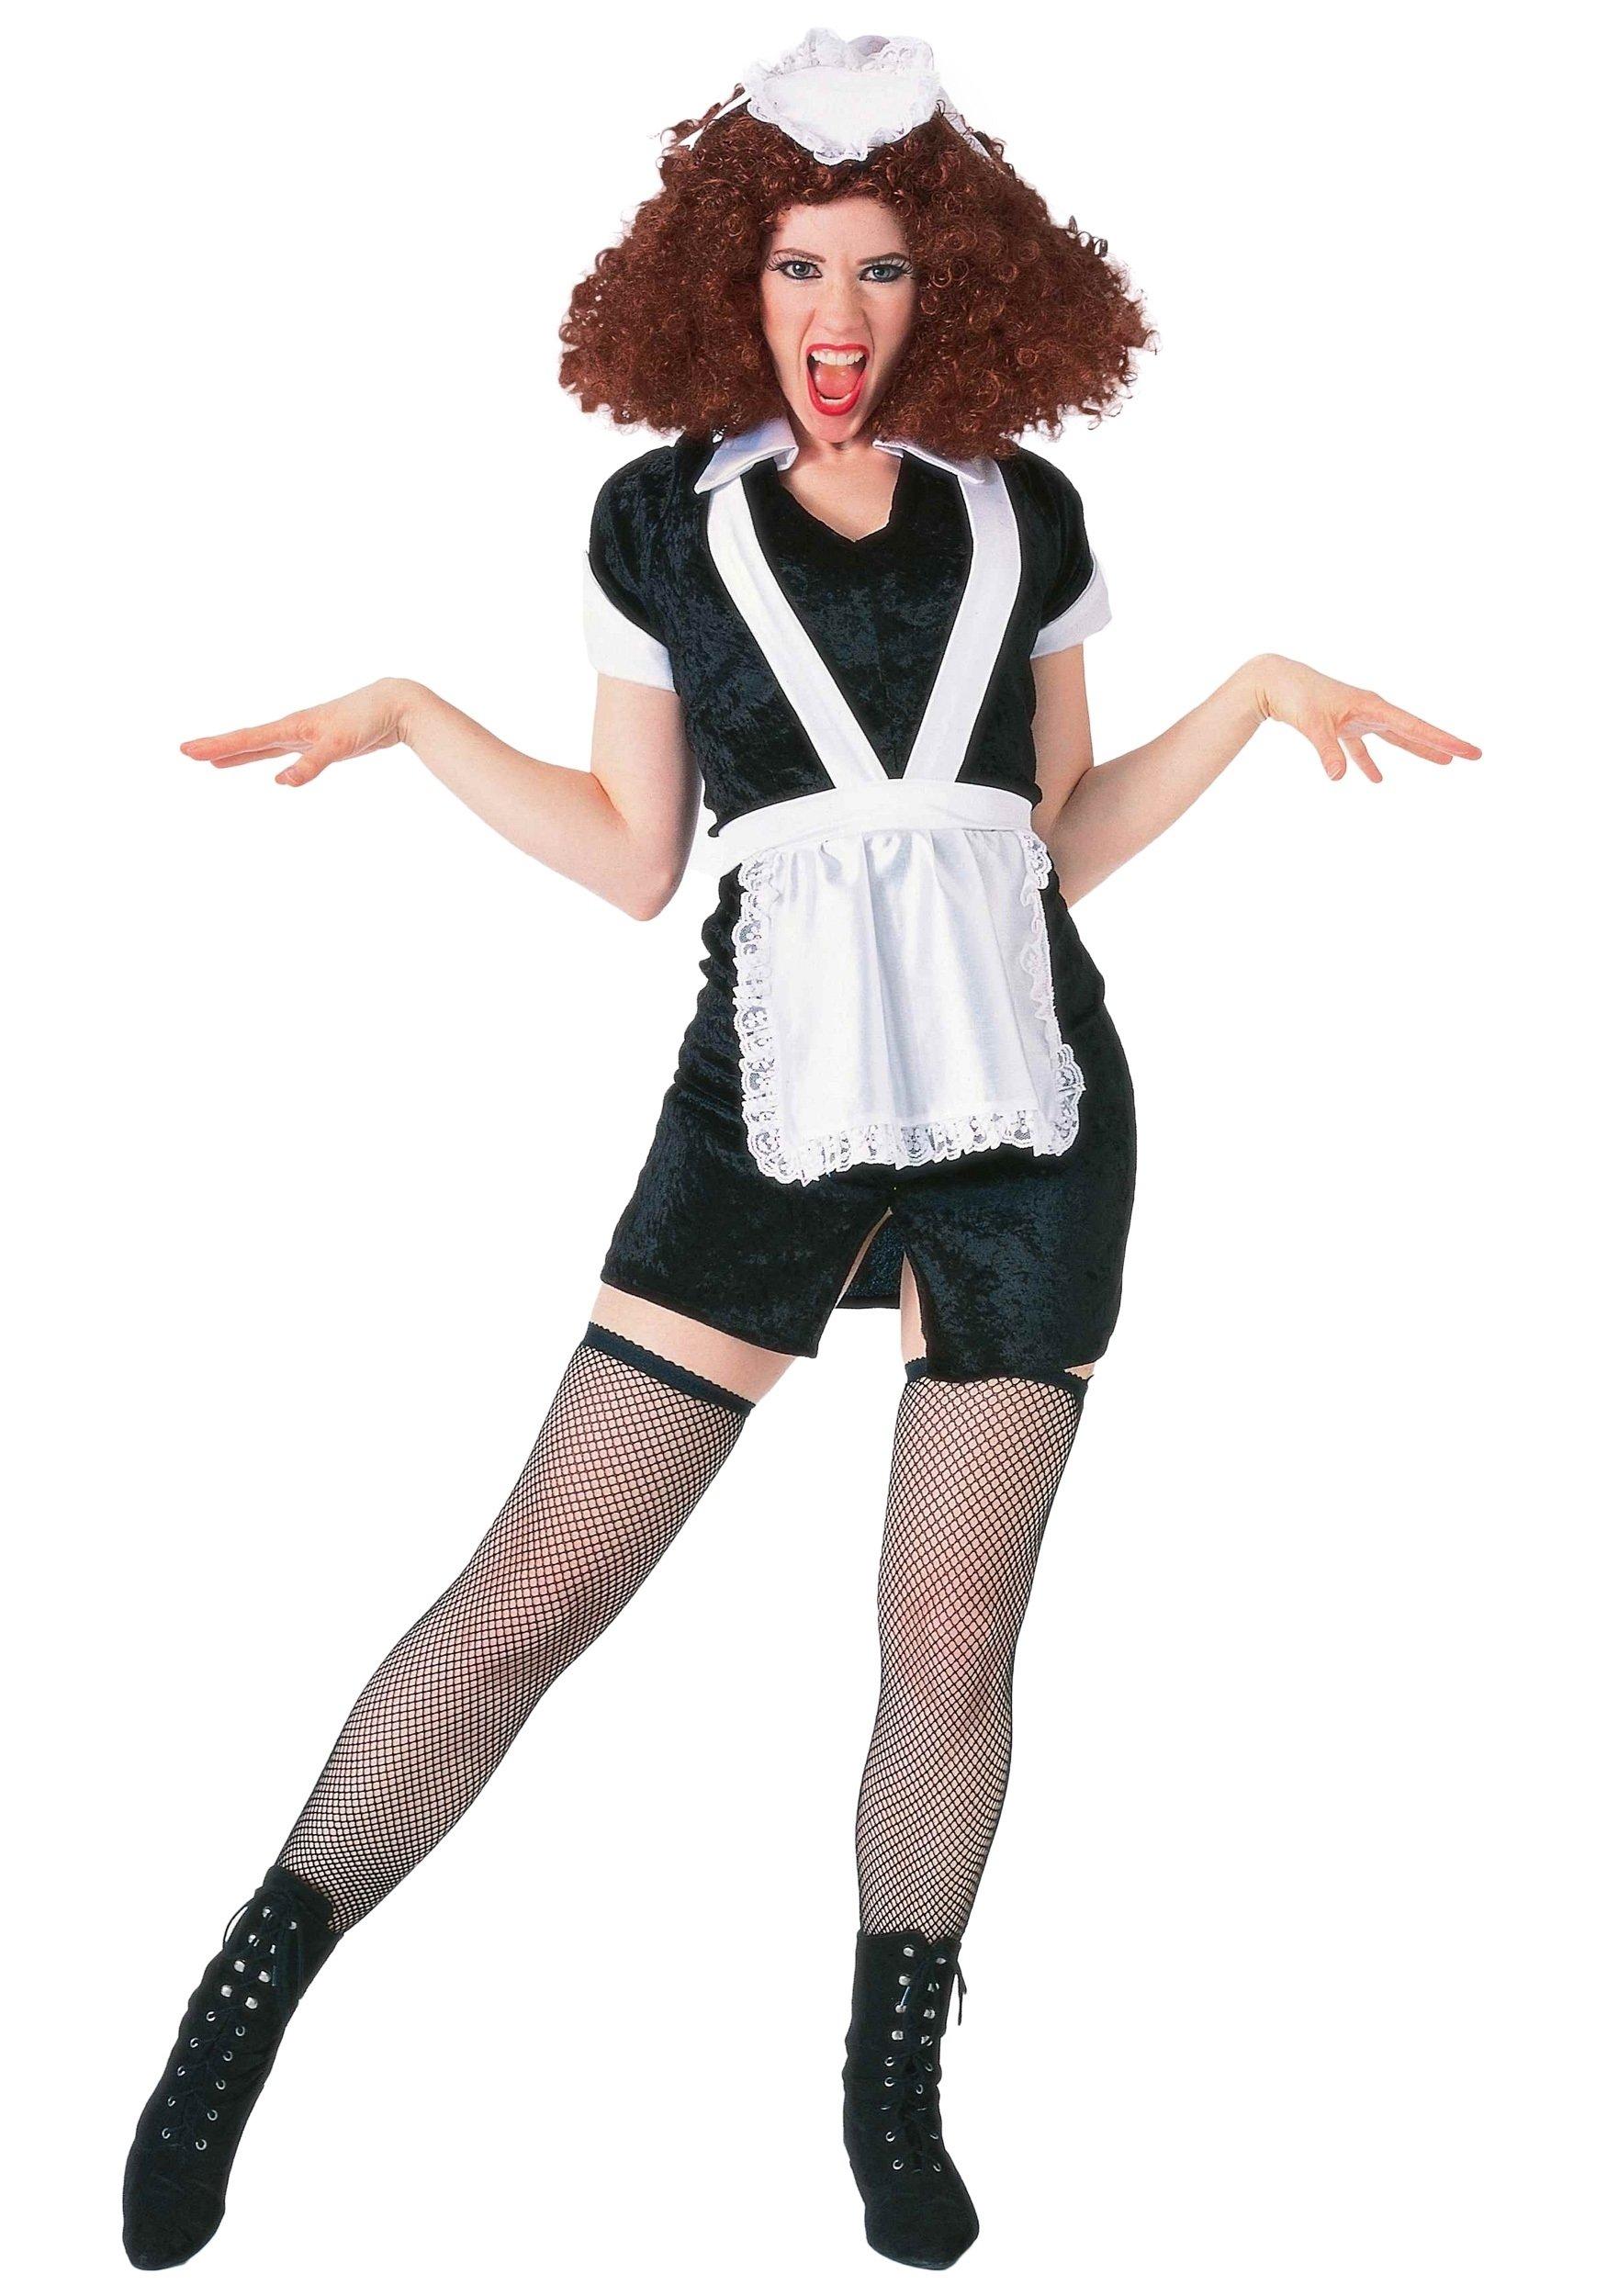 10 Stylish Movie Costume Ideas For Women magenta costume 2021